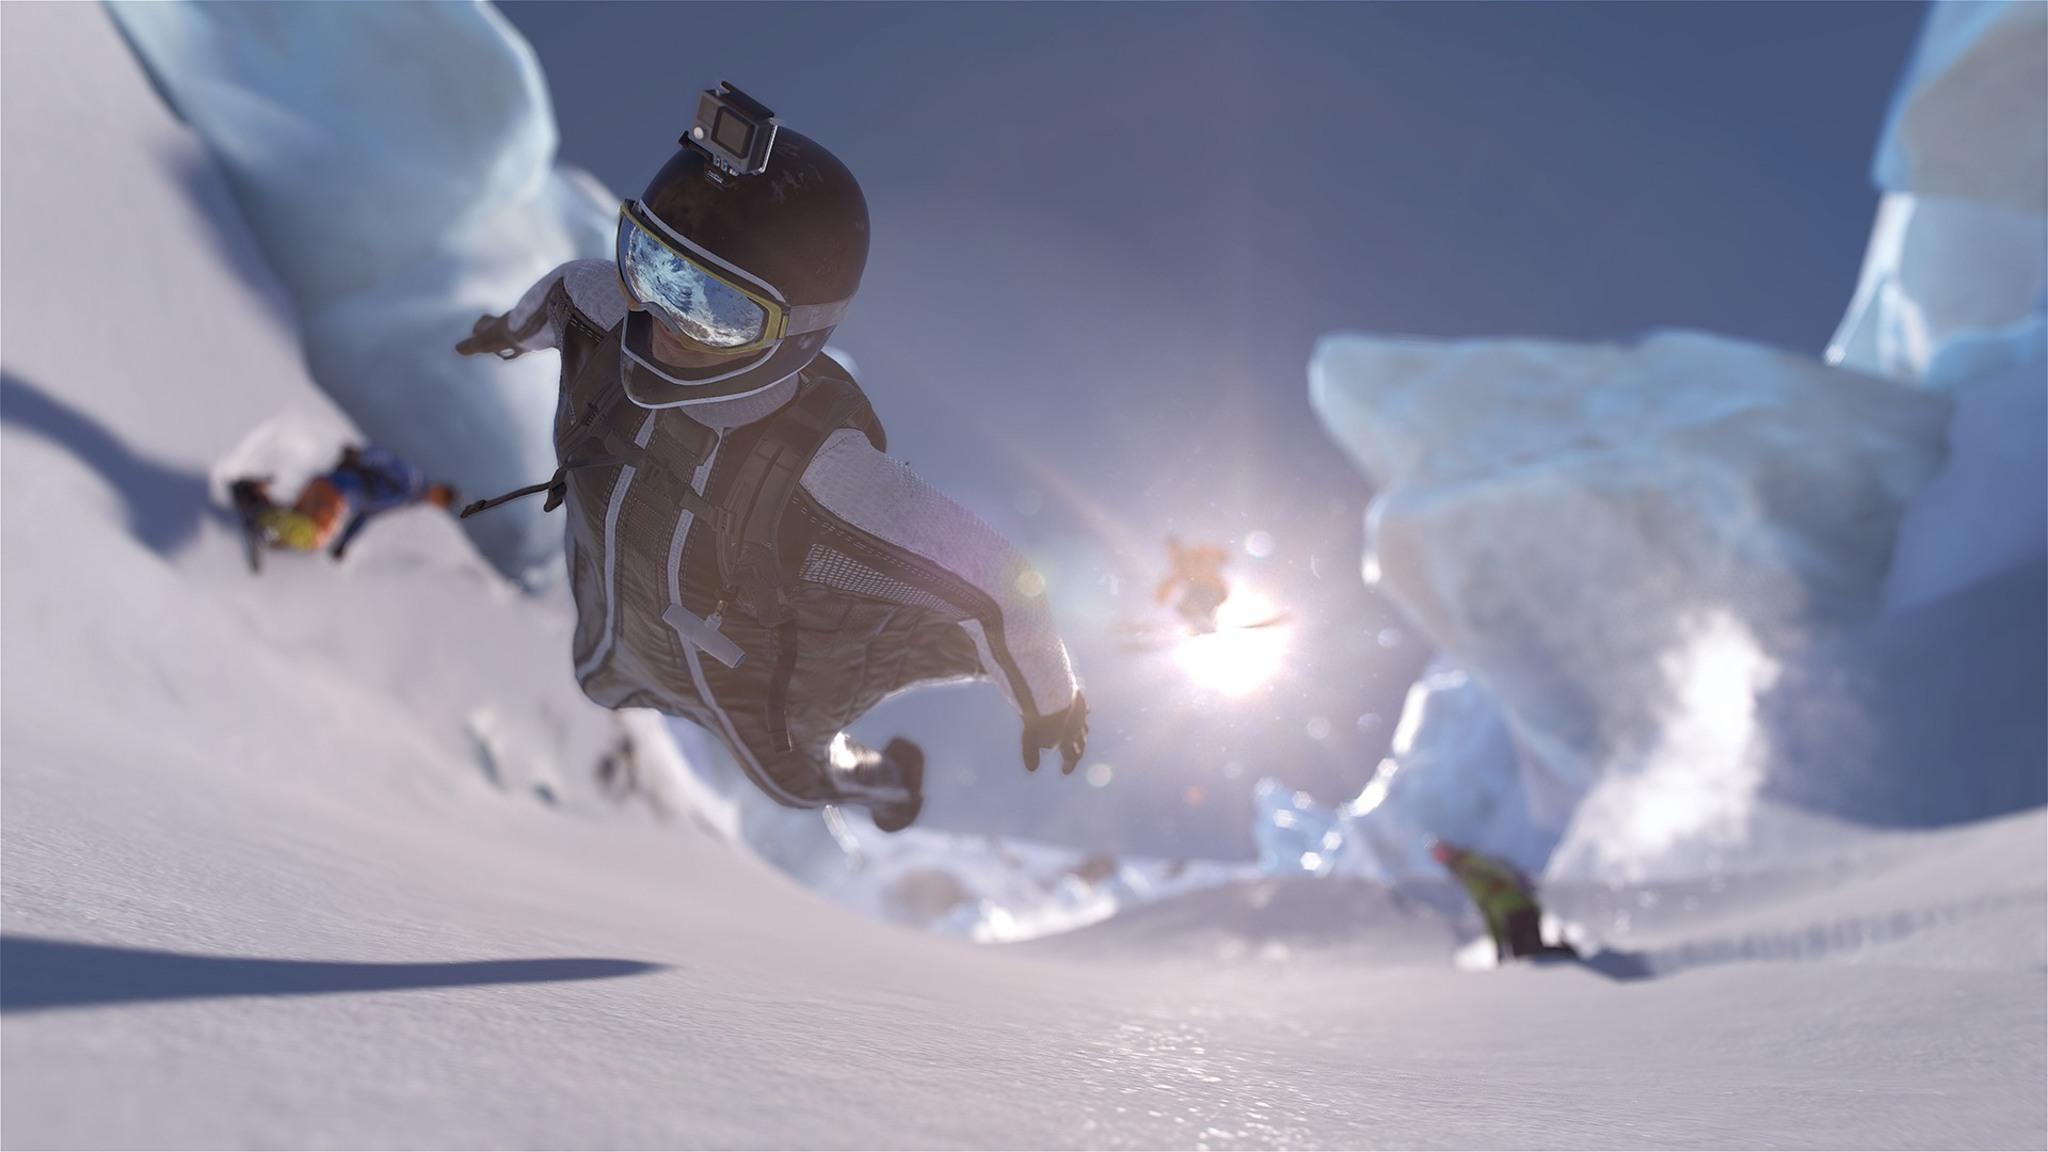 Skiing Backflip Steep Extreme Sport llpaper